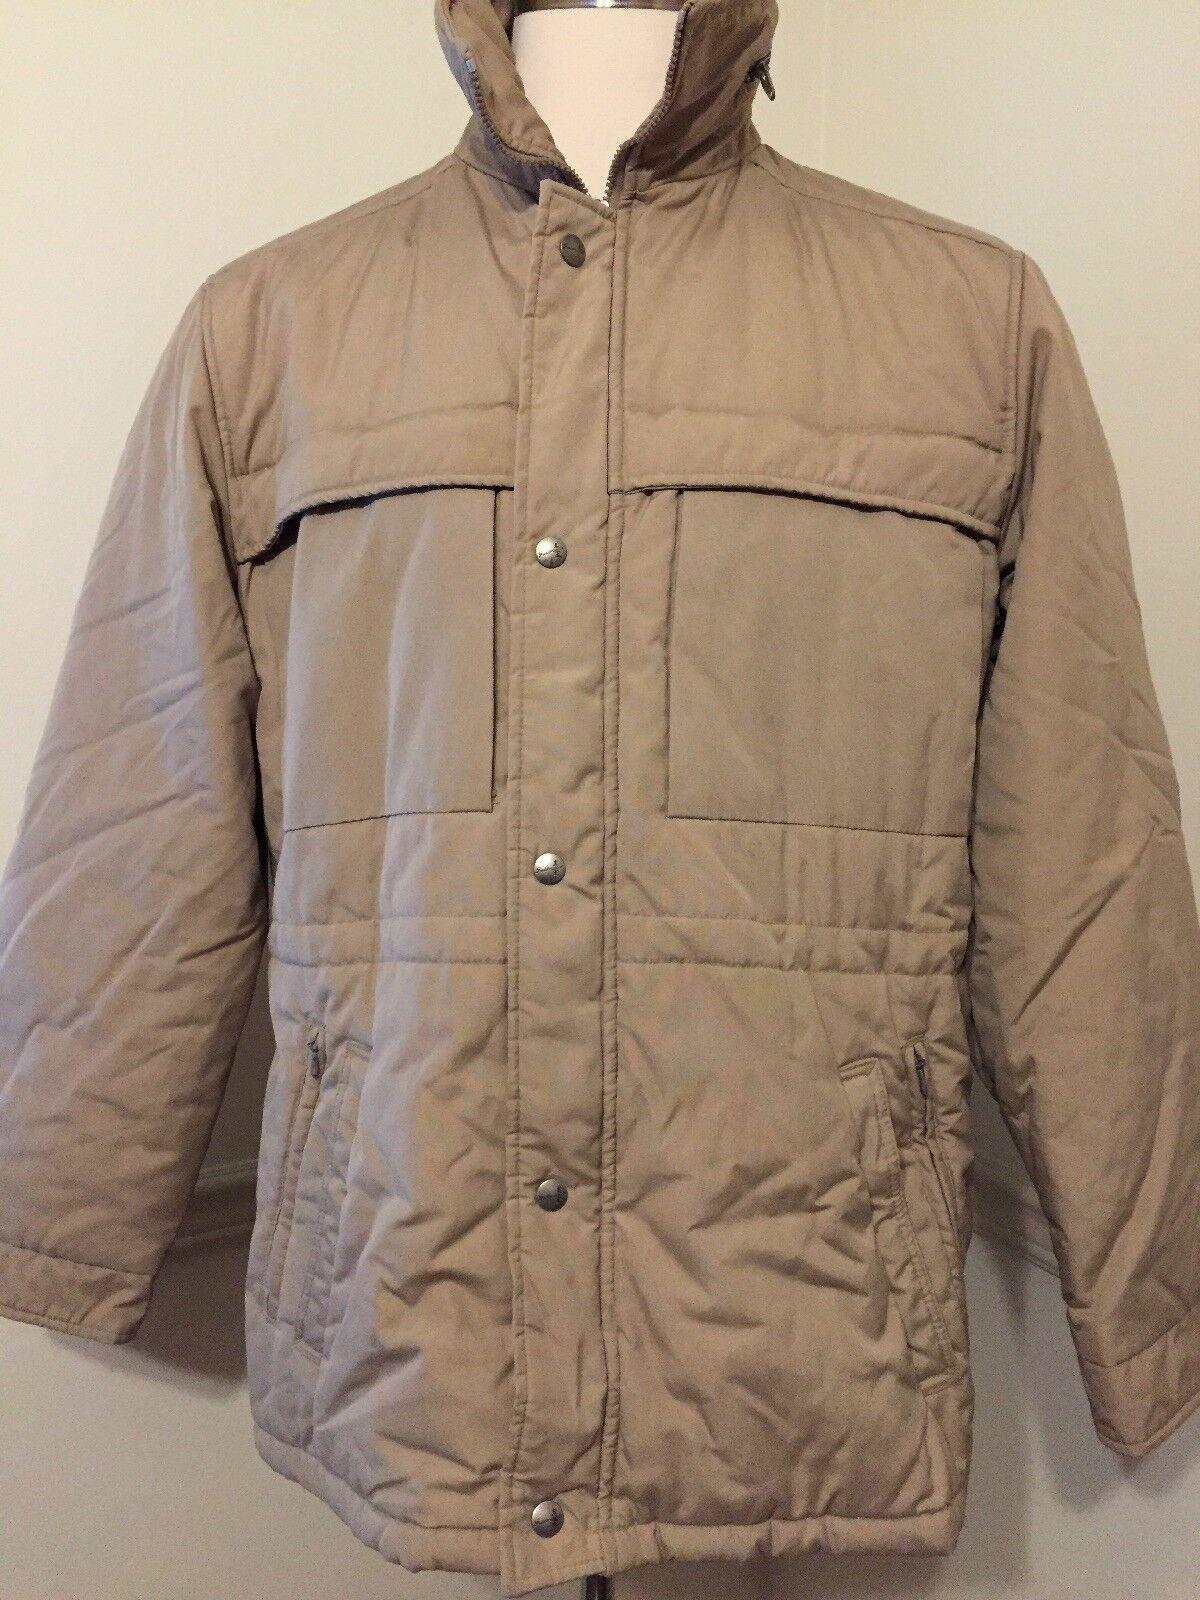 Fieldmaster Lg L Large Men's Tan Insulated Coat Thinsulate Sears Vintage Hood